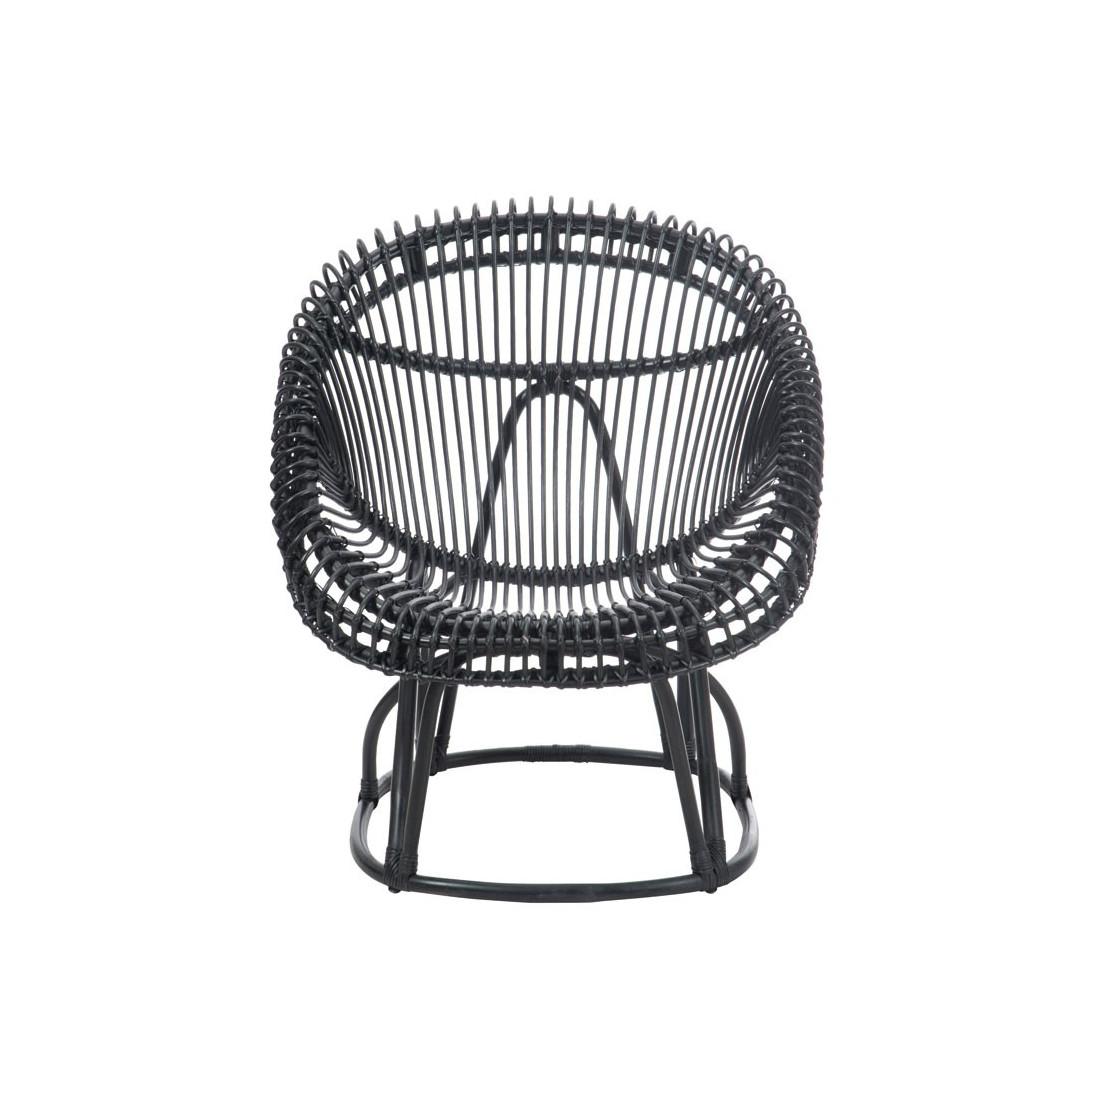 chaise rotin noir mat univers assises tousmesmeubles - Chaise Rotin Noir